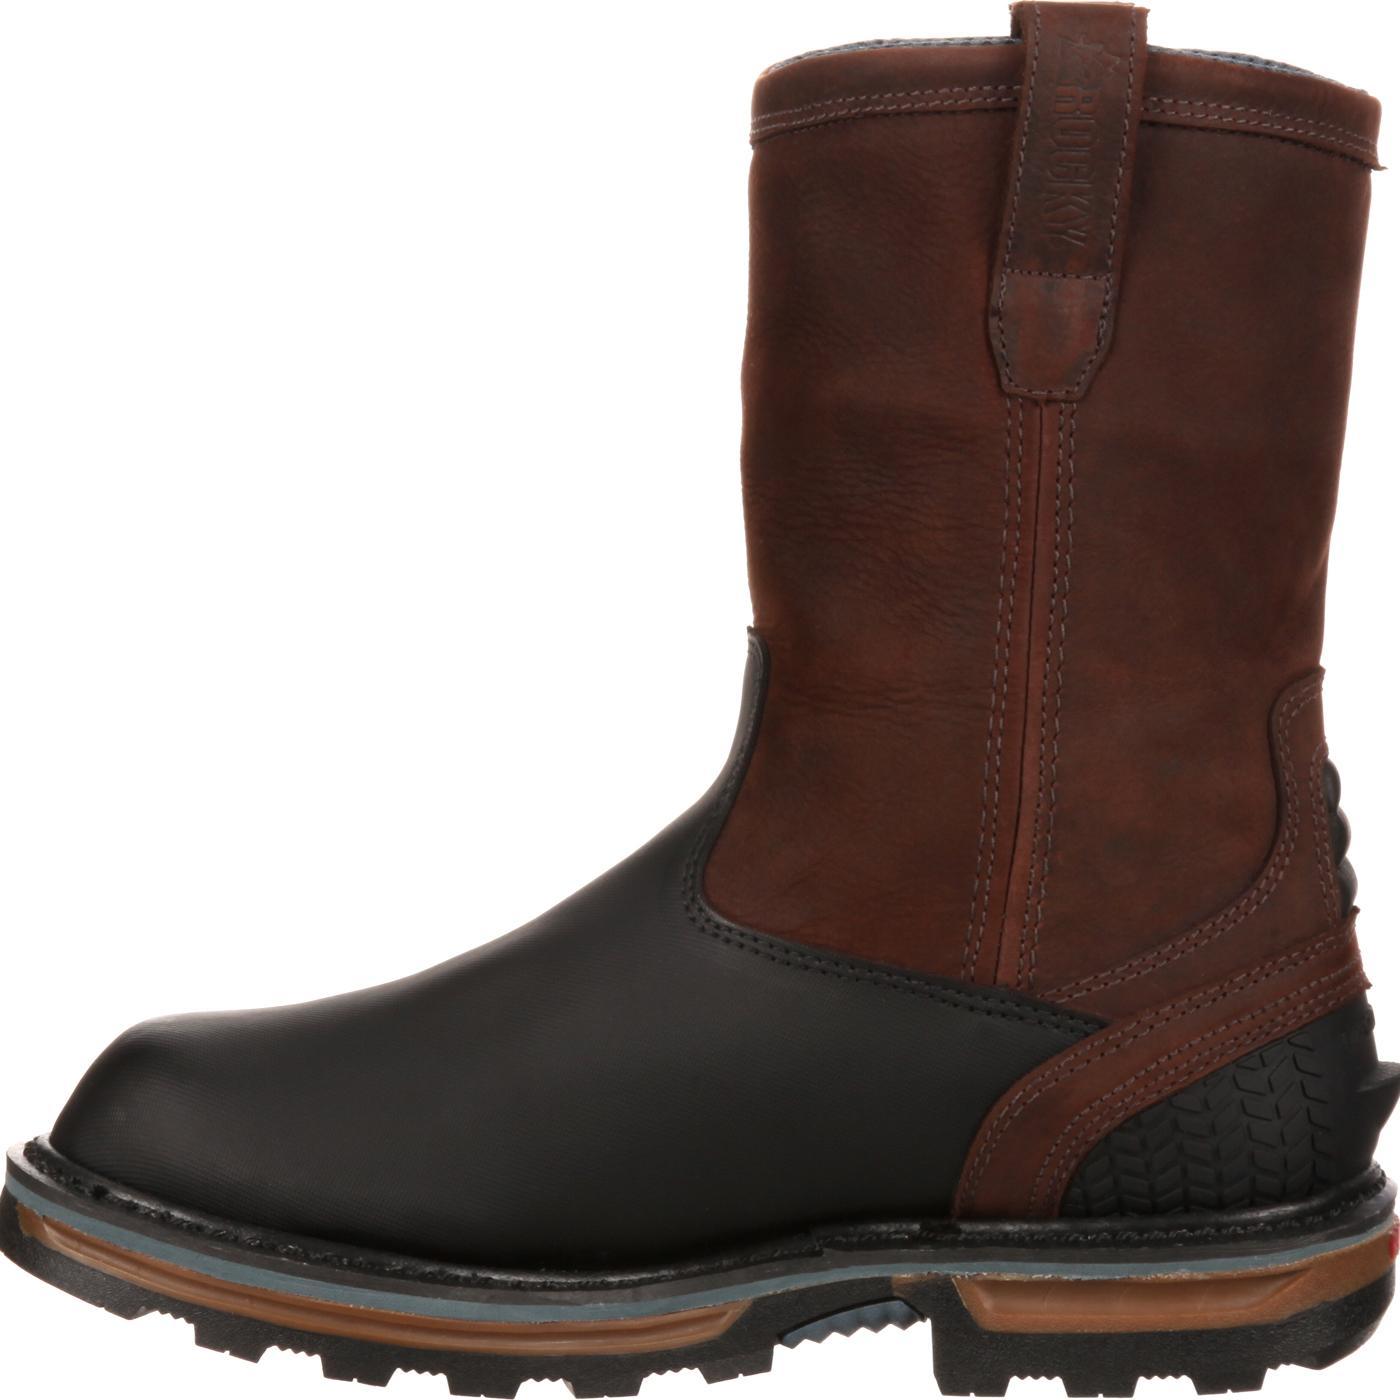 Fashionable steel toe work boots 29